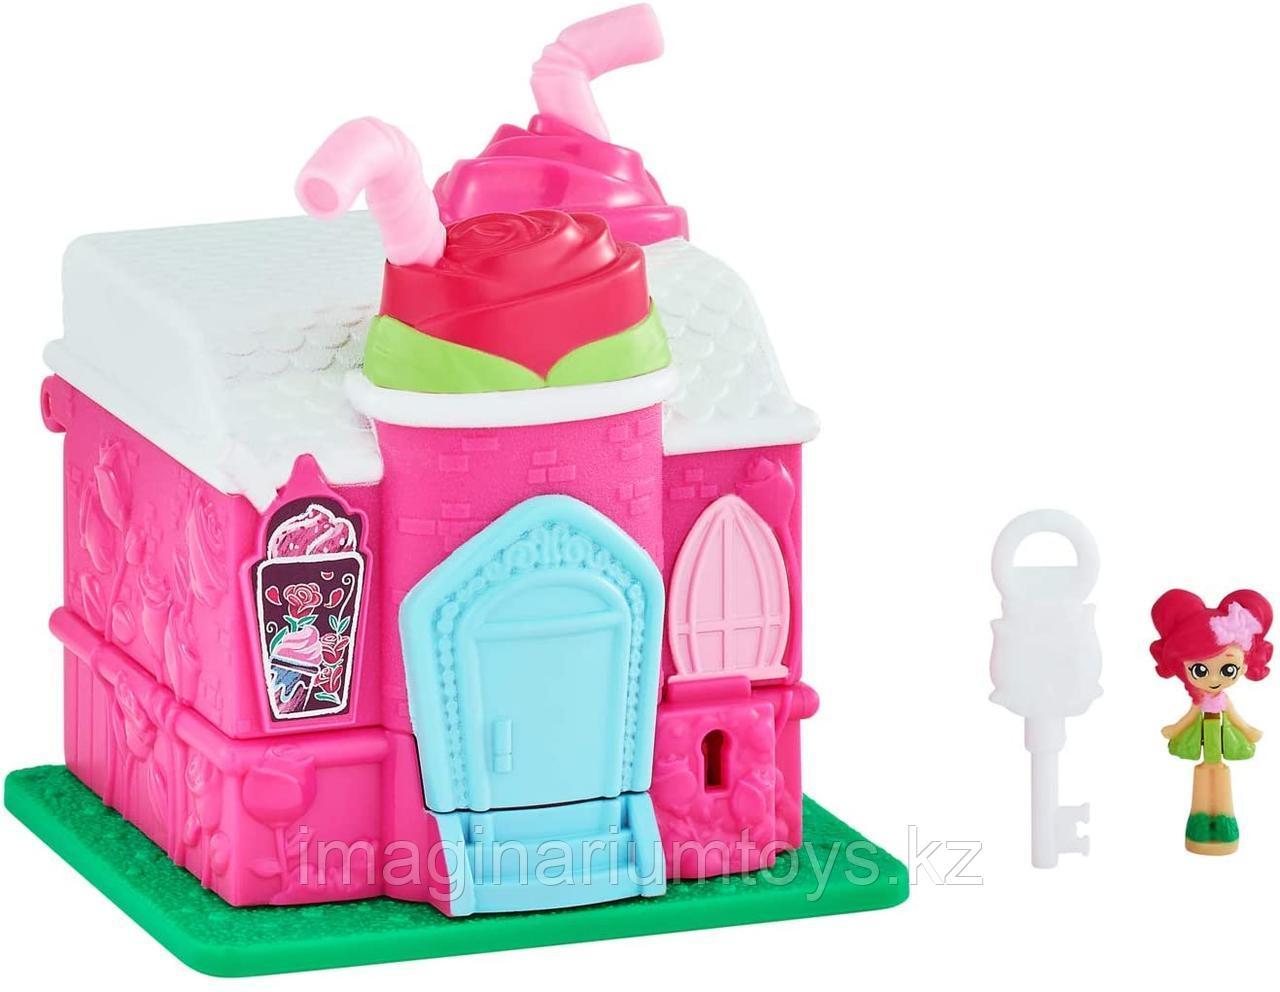 Шопкинс набор домик с секретом Кафе Рози Блум Shopkins